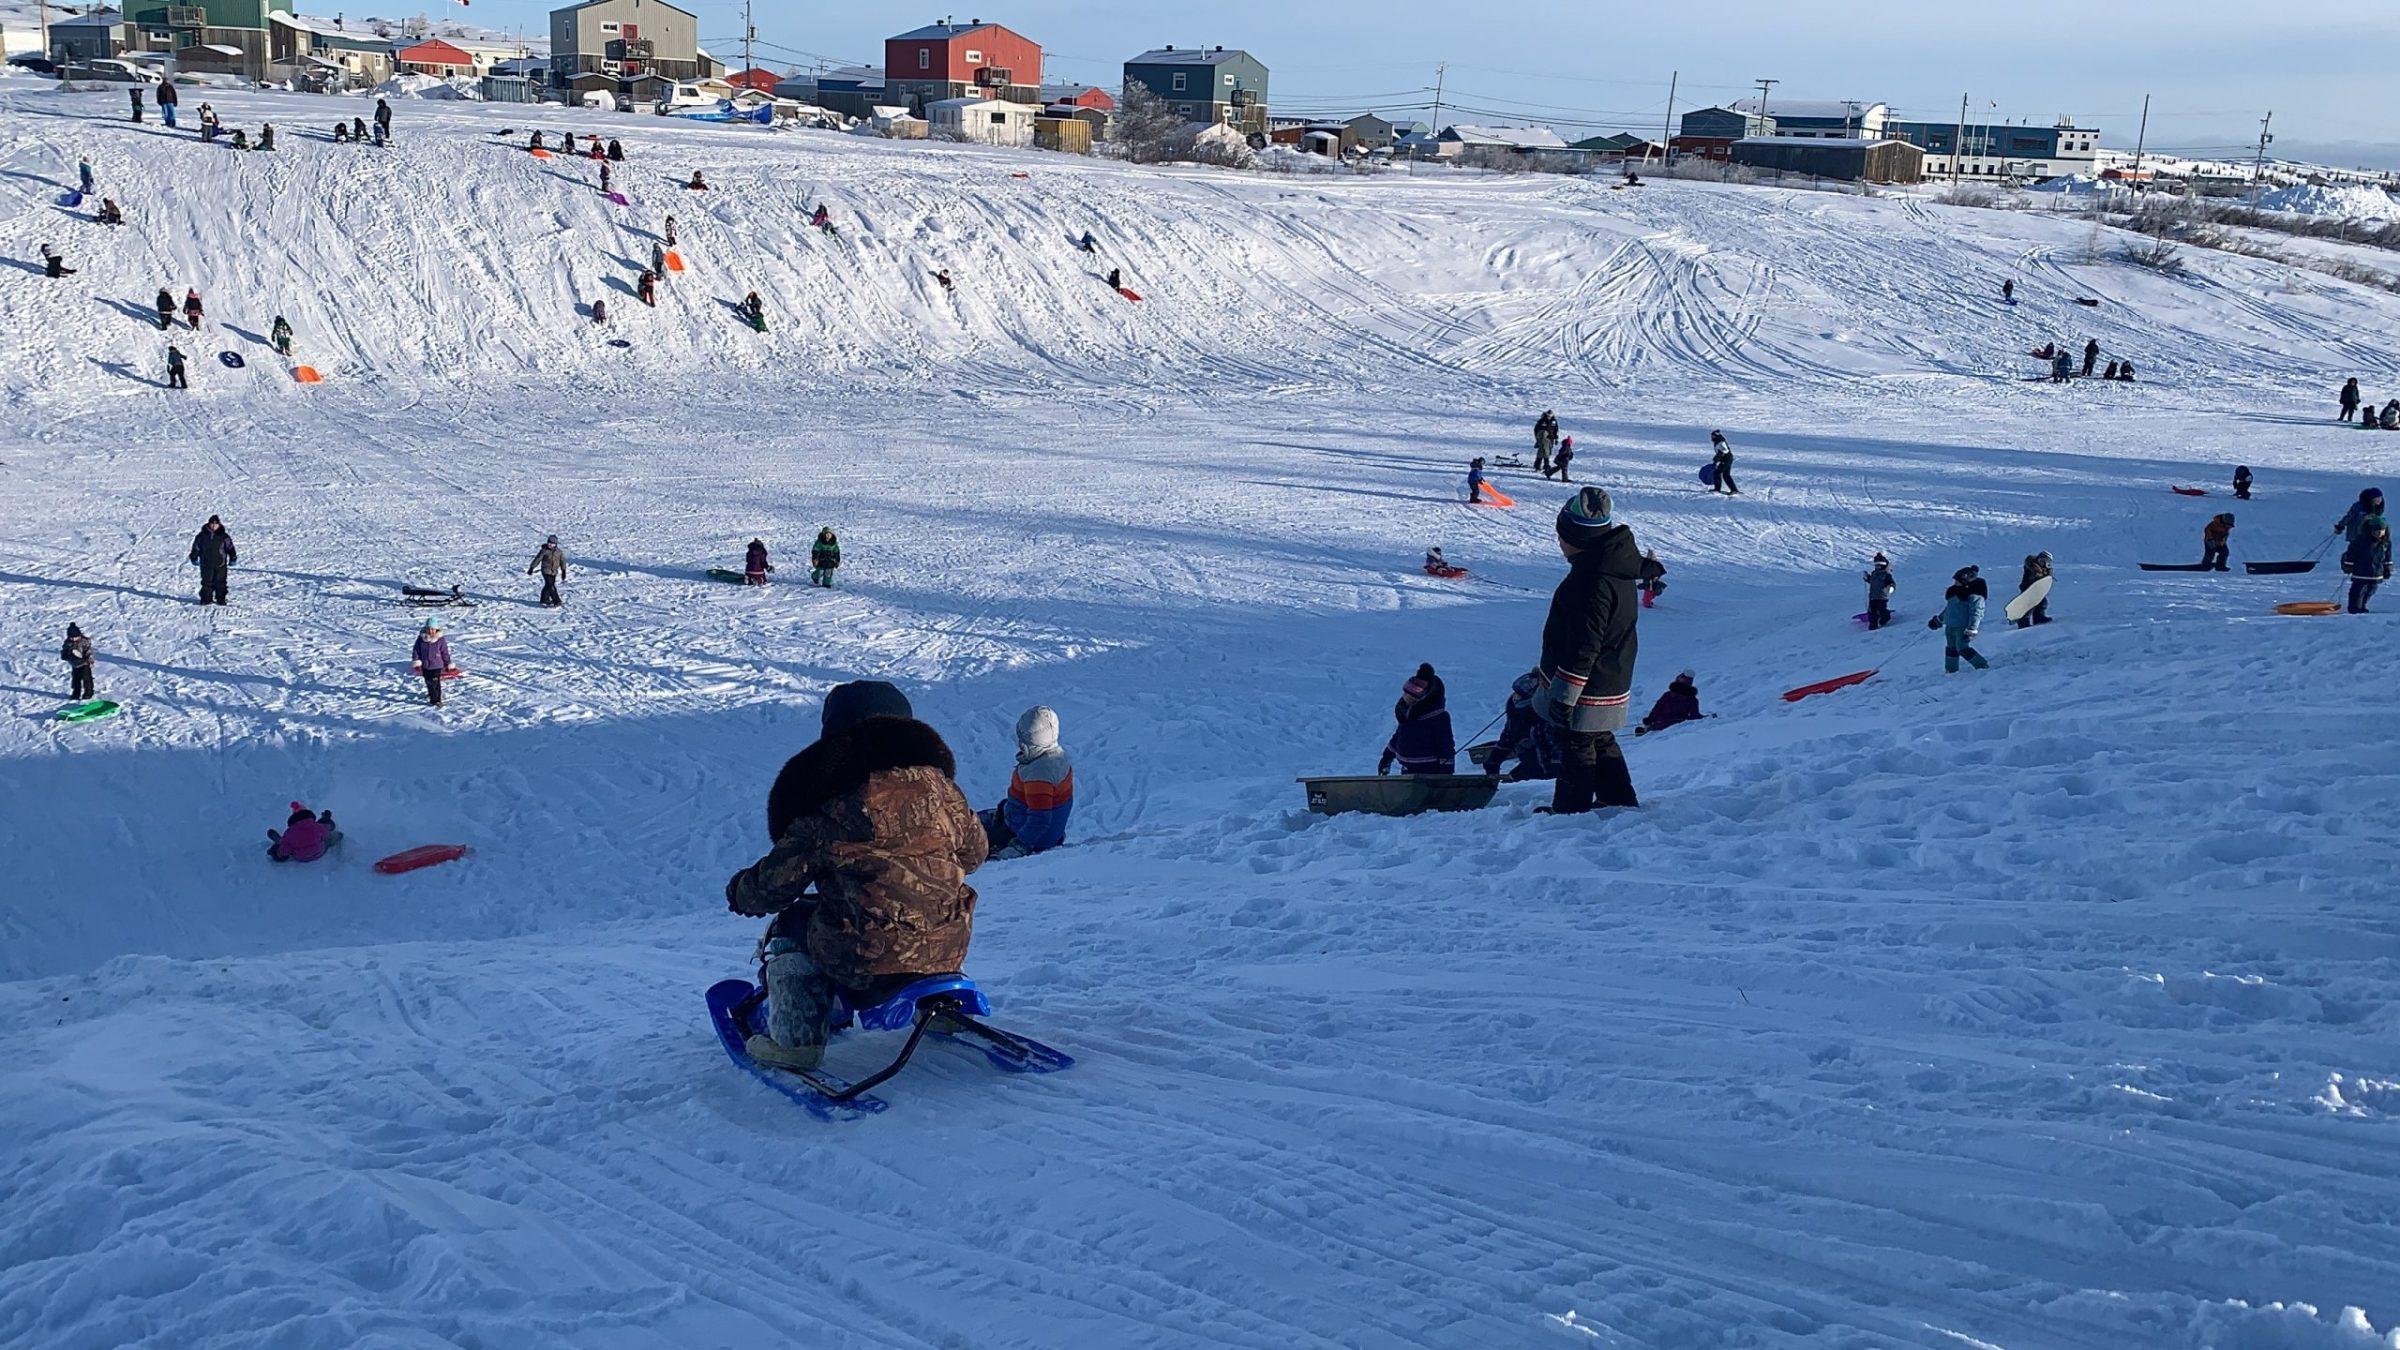 Kuujjuaq children flock to a popular sledding hill Jan. 29. (Photo by Malaya Qaunirq Chapman)